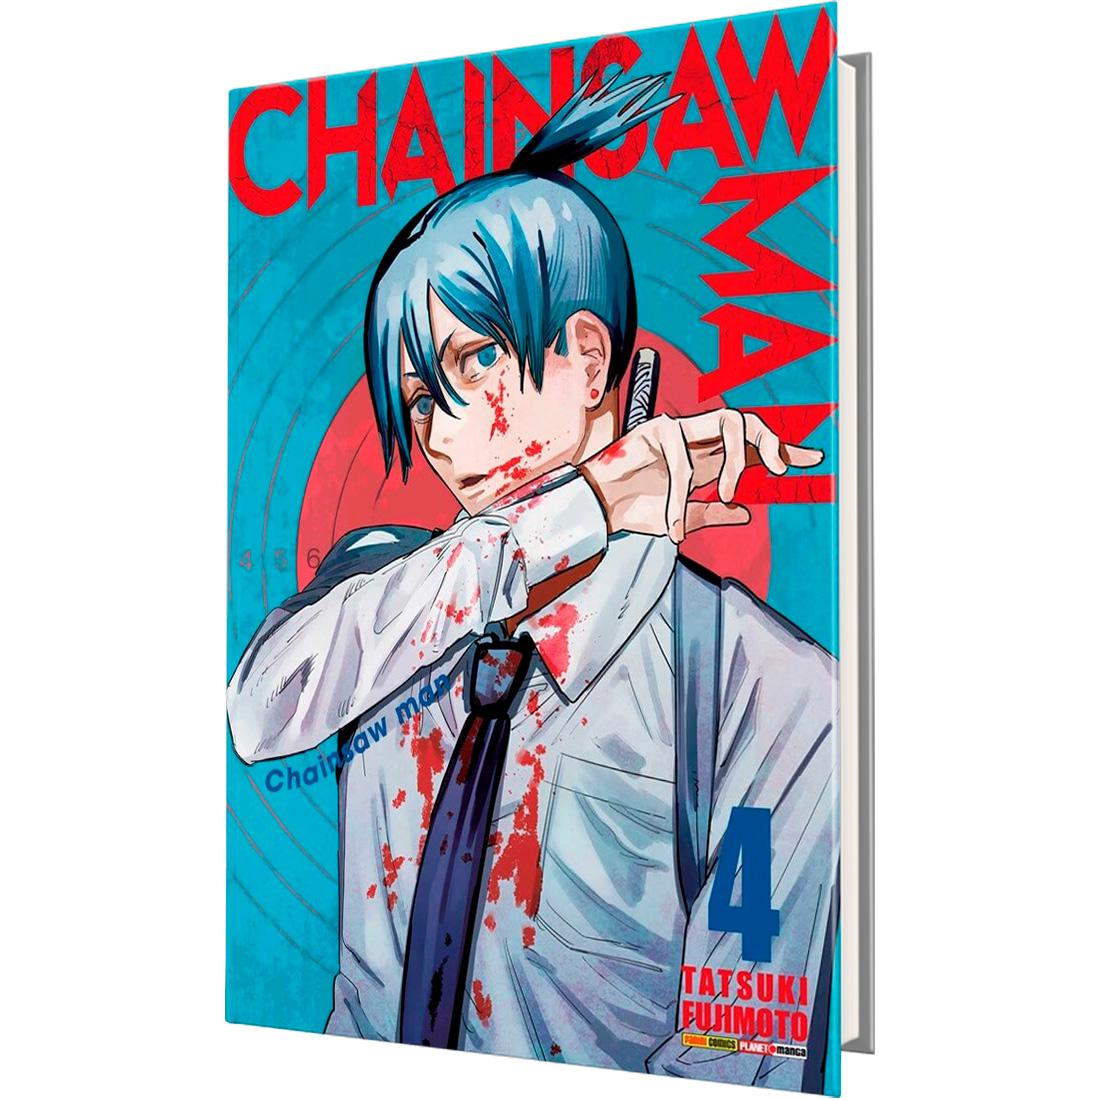 Chainsaw Man Vol. 4